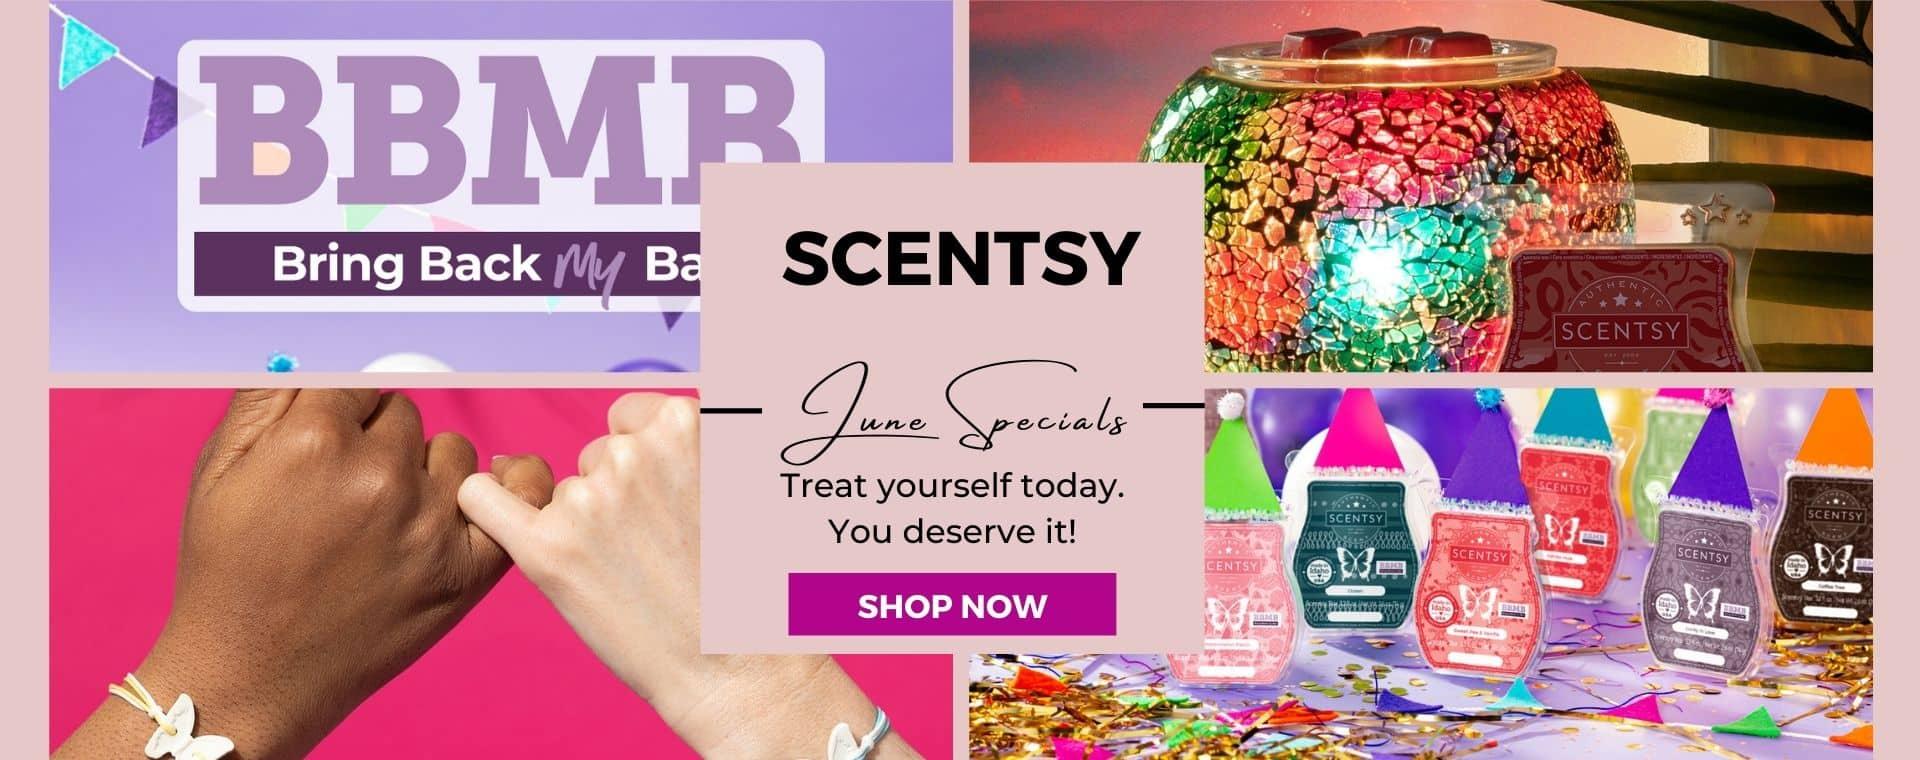 Scentsy June 2021 Specials 3